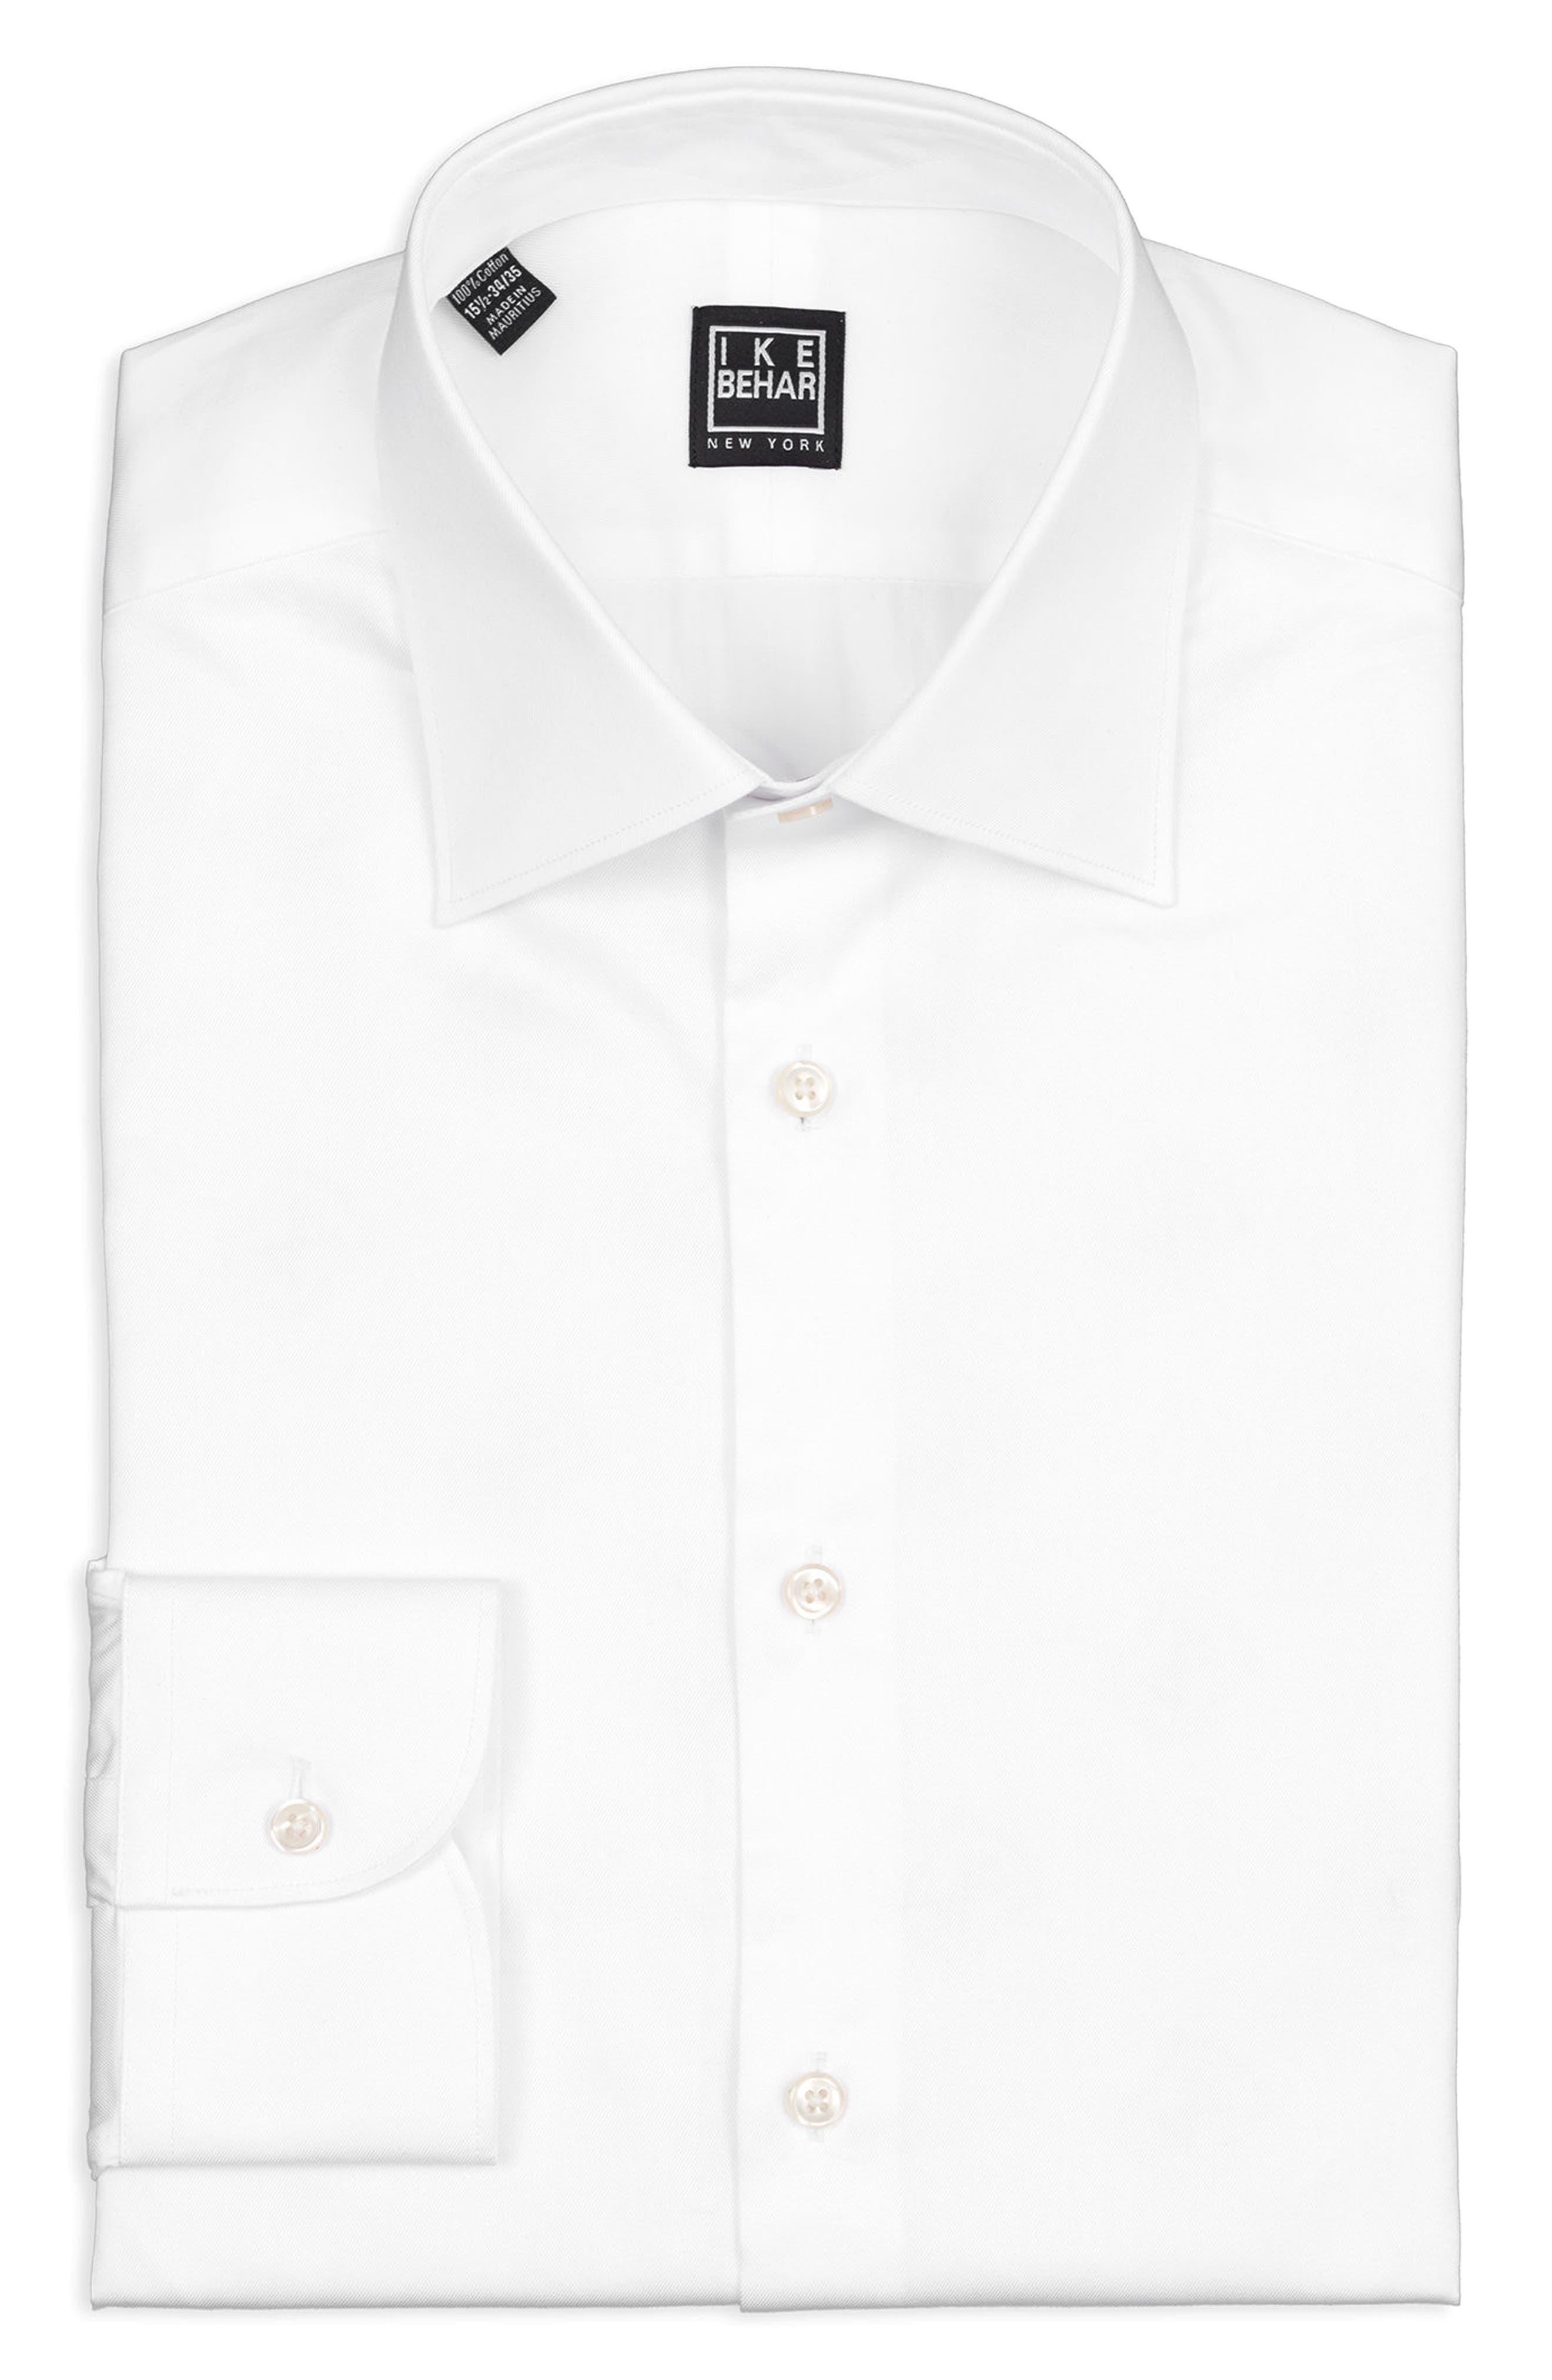 Regular Fit Solid Dress Shirt,                             Alternate thumbnail 5, color,                             100